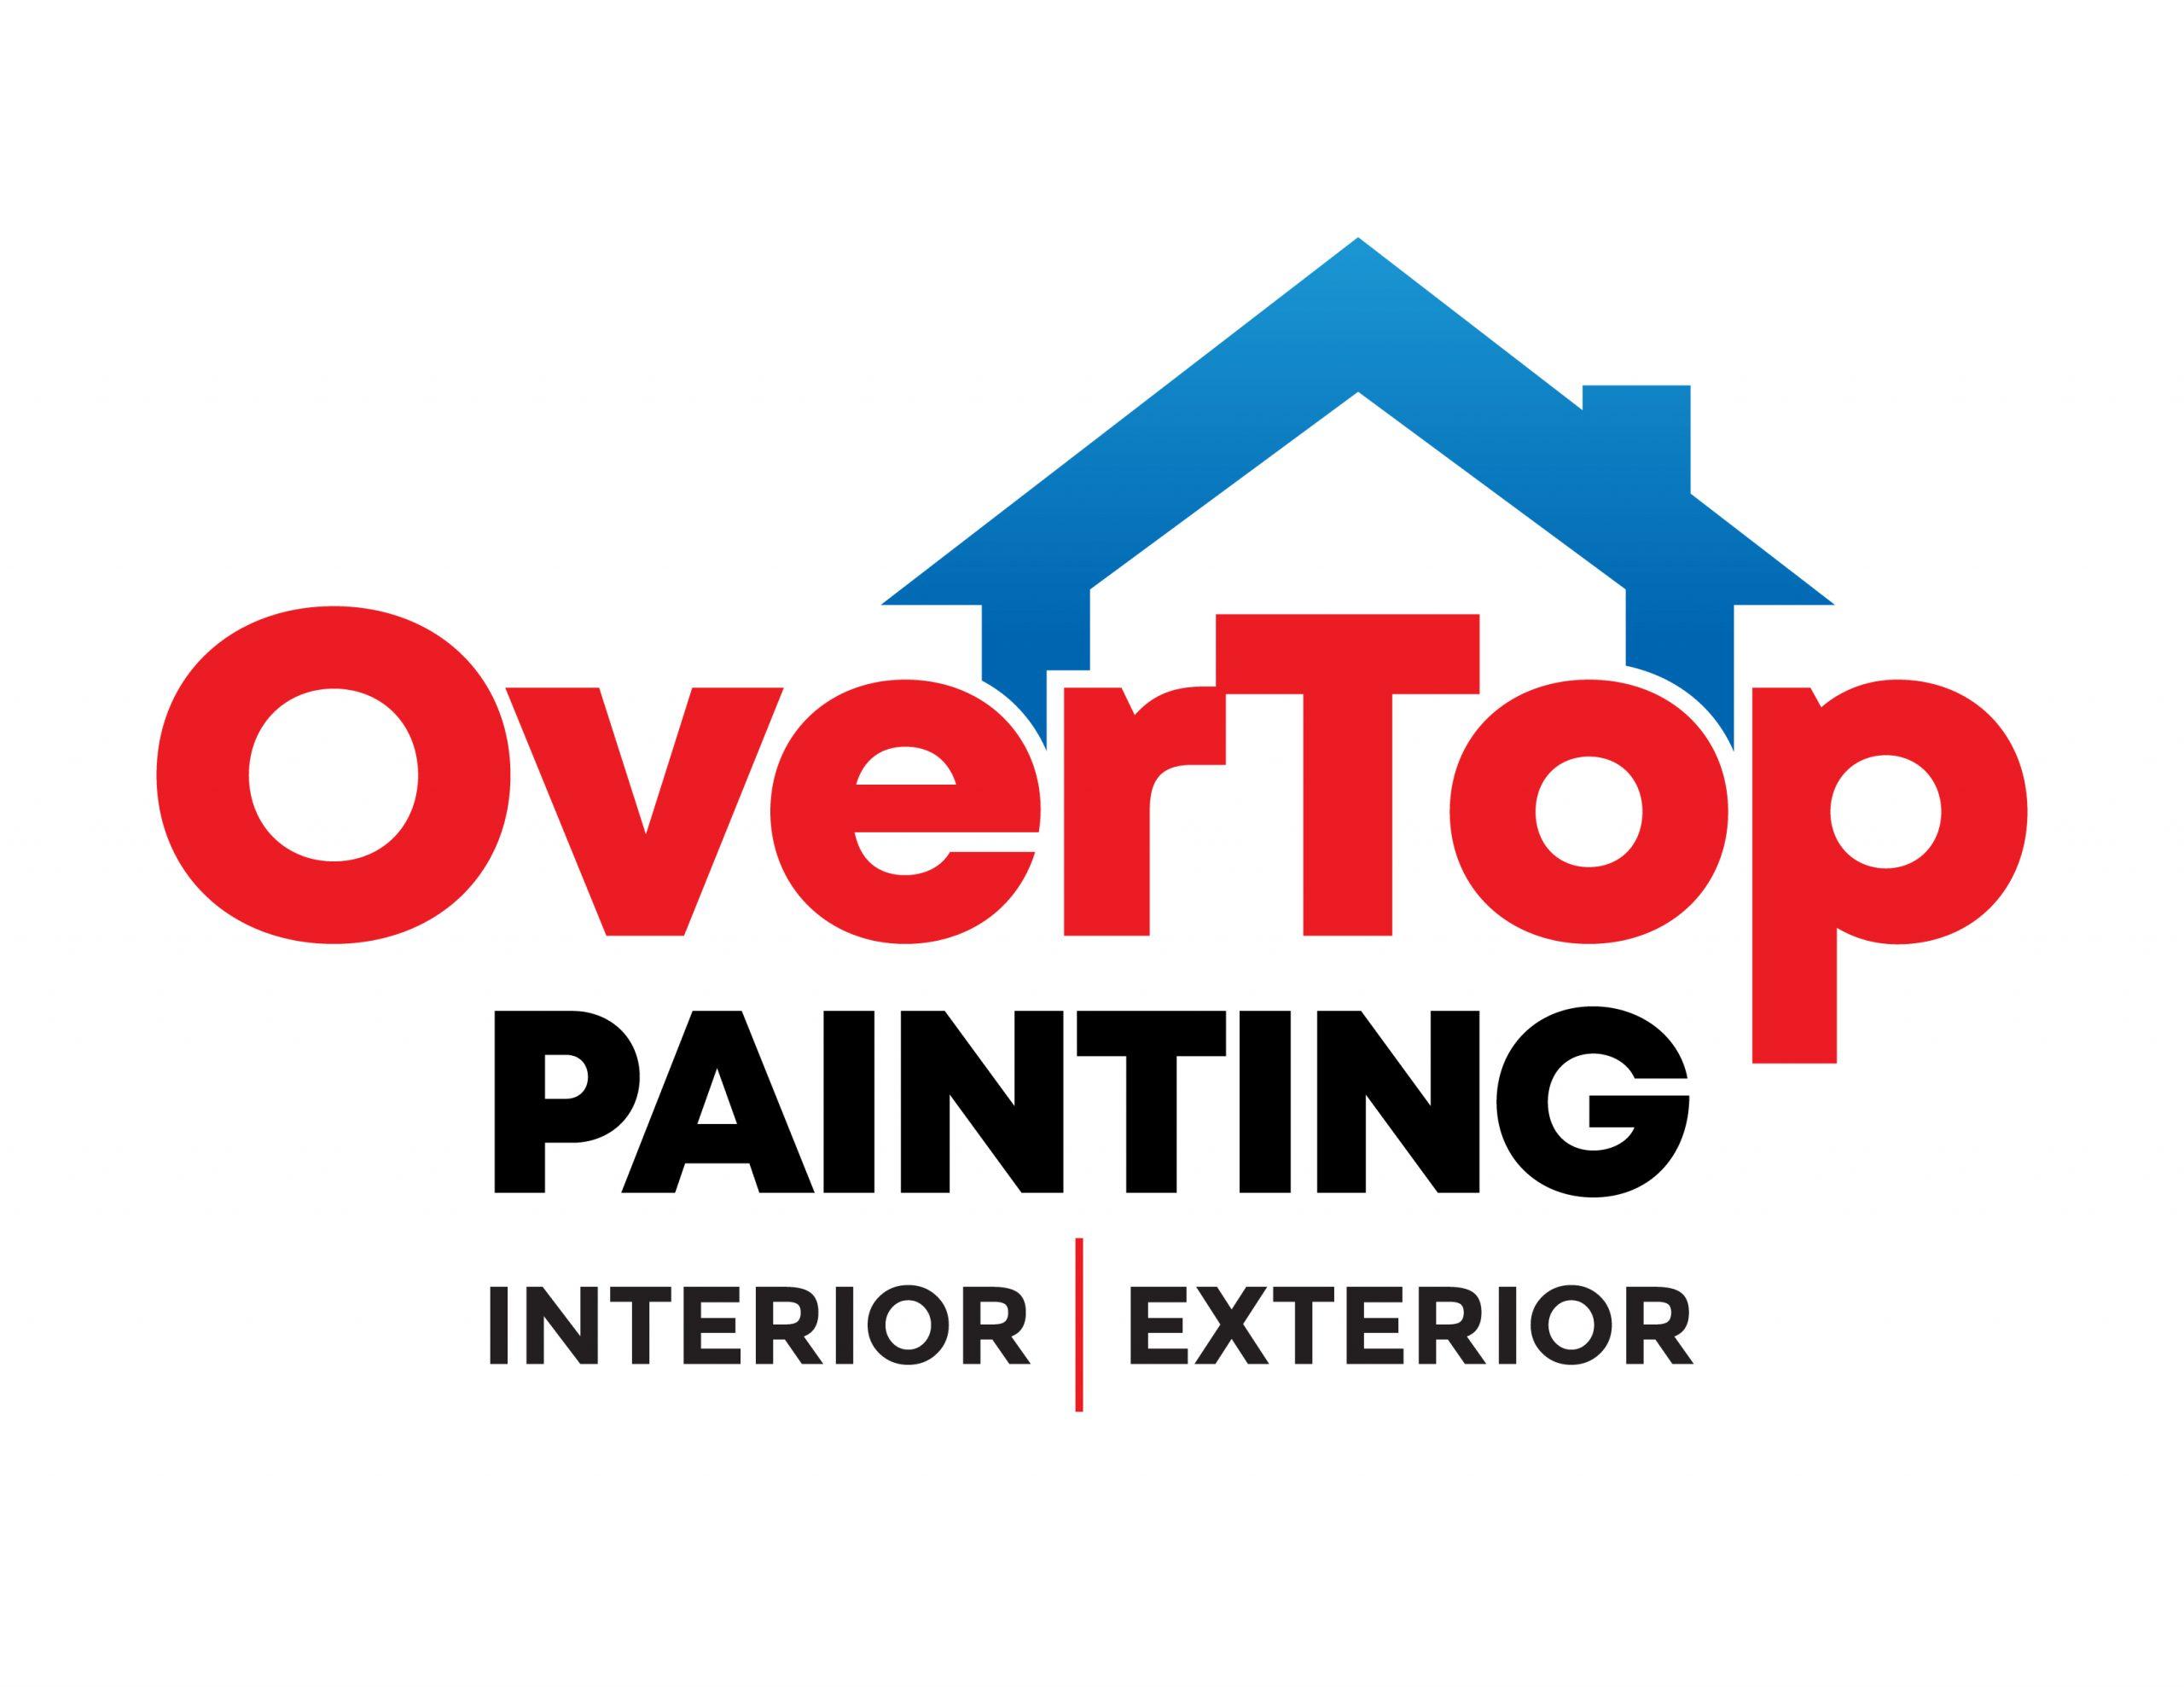 OverTop Painting Orlando